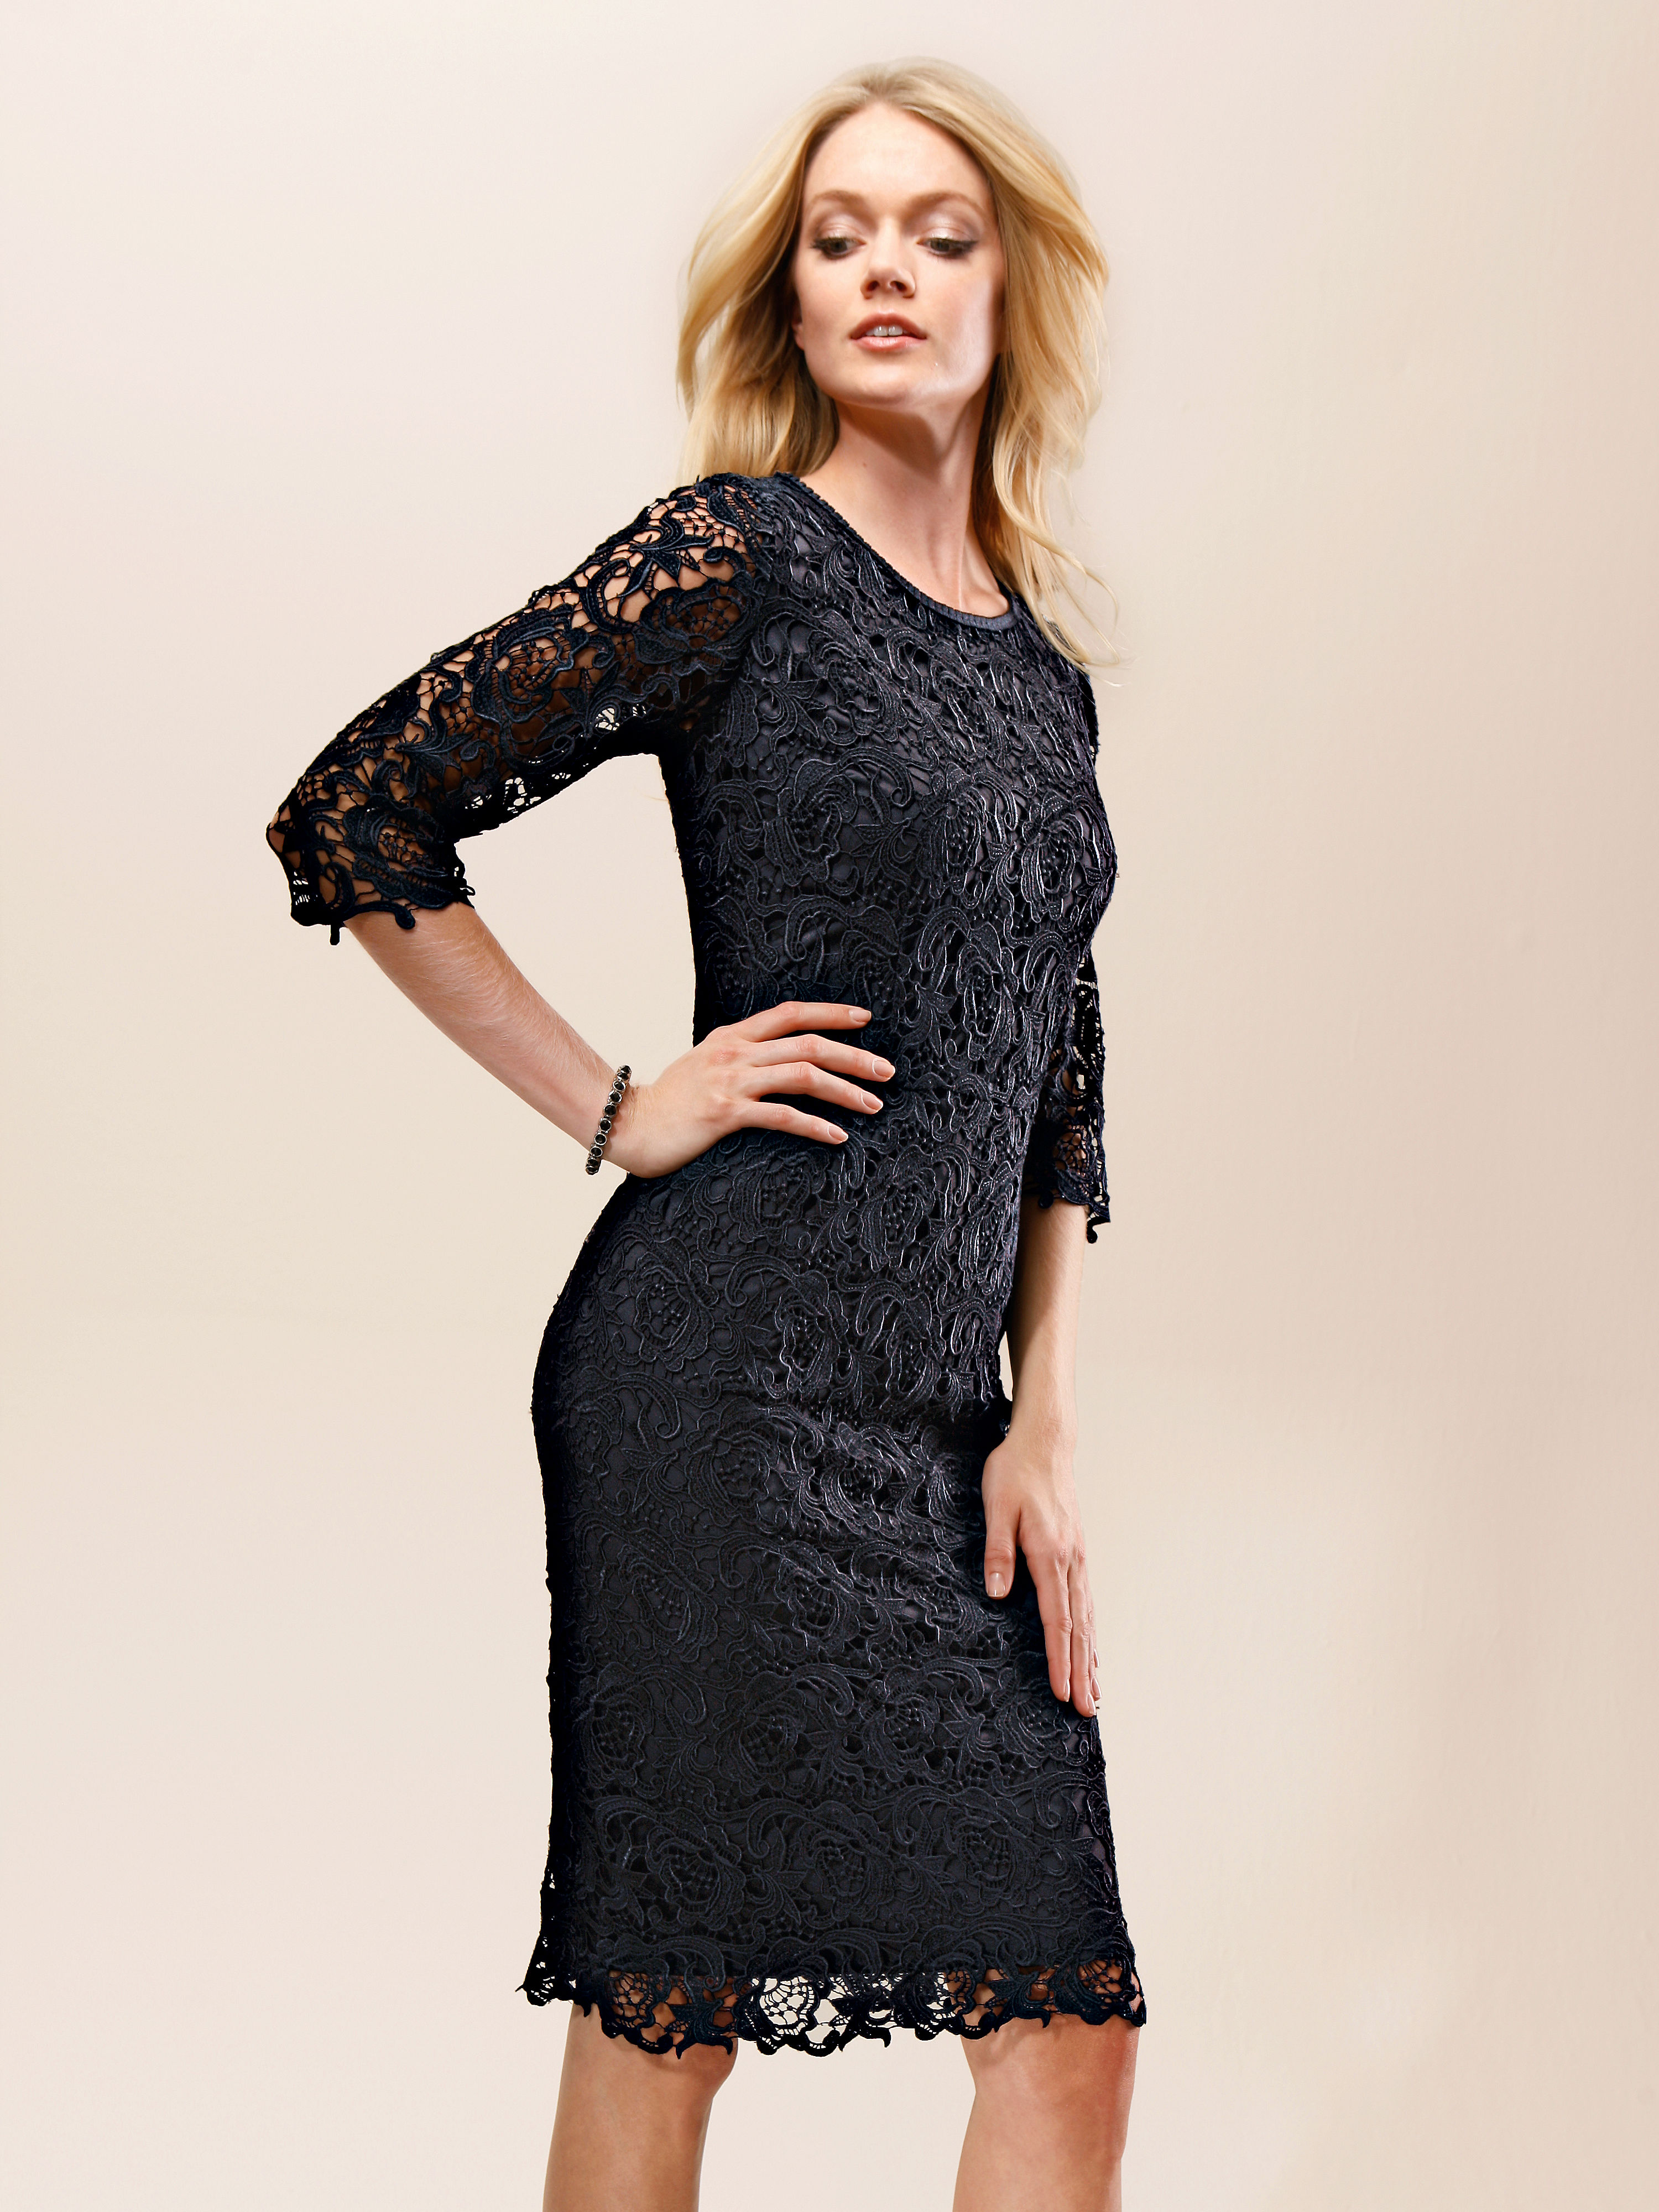 Lace dress 3/4-length sleeves Uta Raasch black Uta Raasch JR2KJ87v